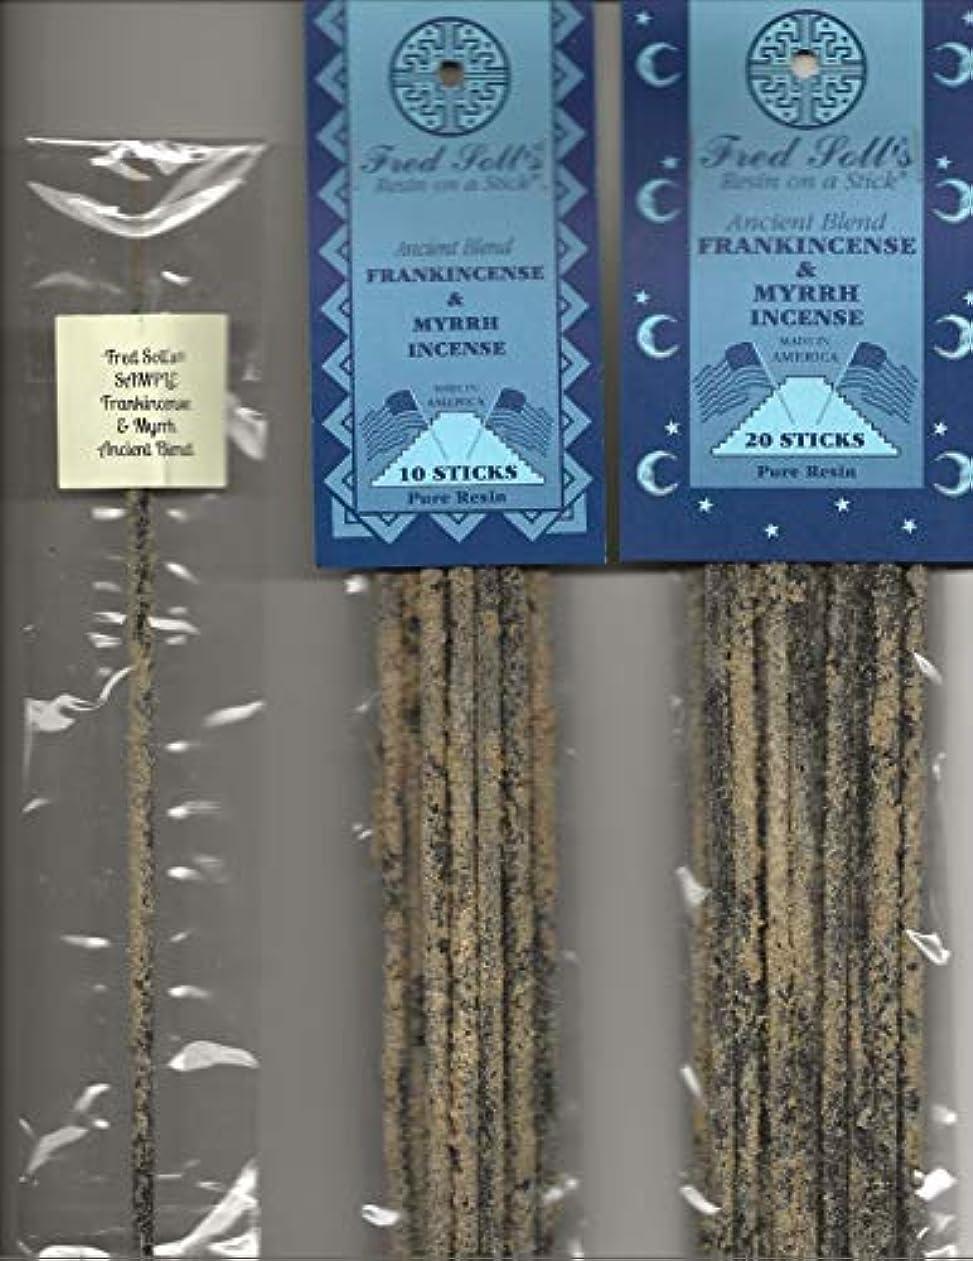 Fred Soll 's Frankincense & Myrrh、古代ブレンドIncense、20 Sticks